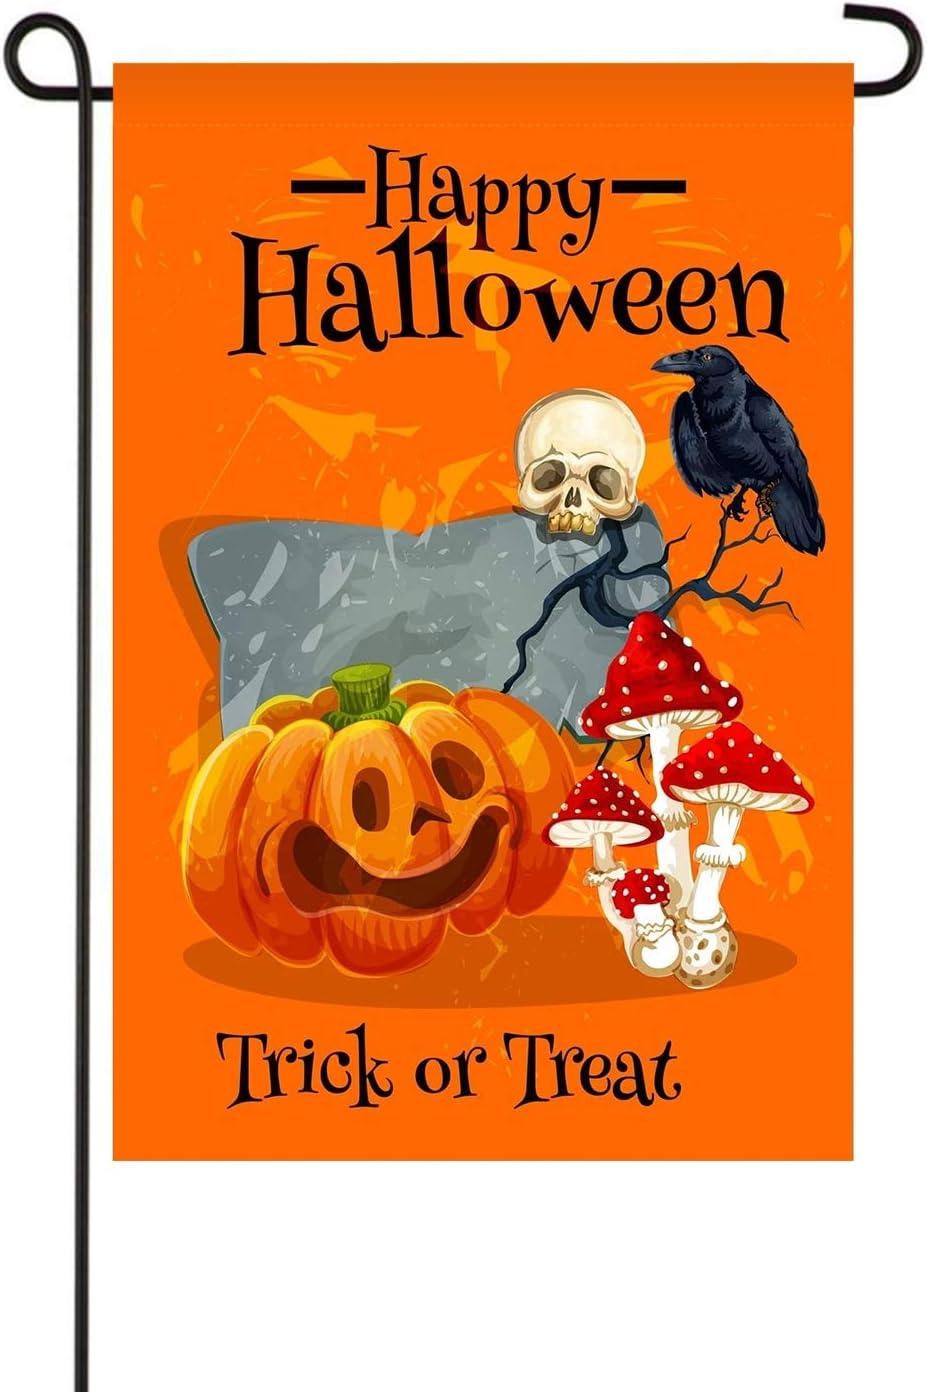 Happy Halloween Garden Flag,Trick or Treat Letter,Skeleton Crow Pumpkin Yard Outdoor Decoration